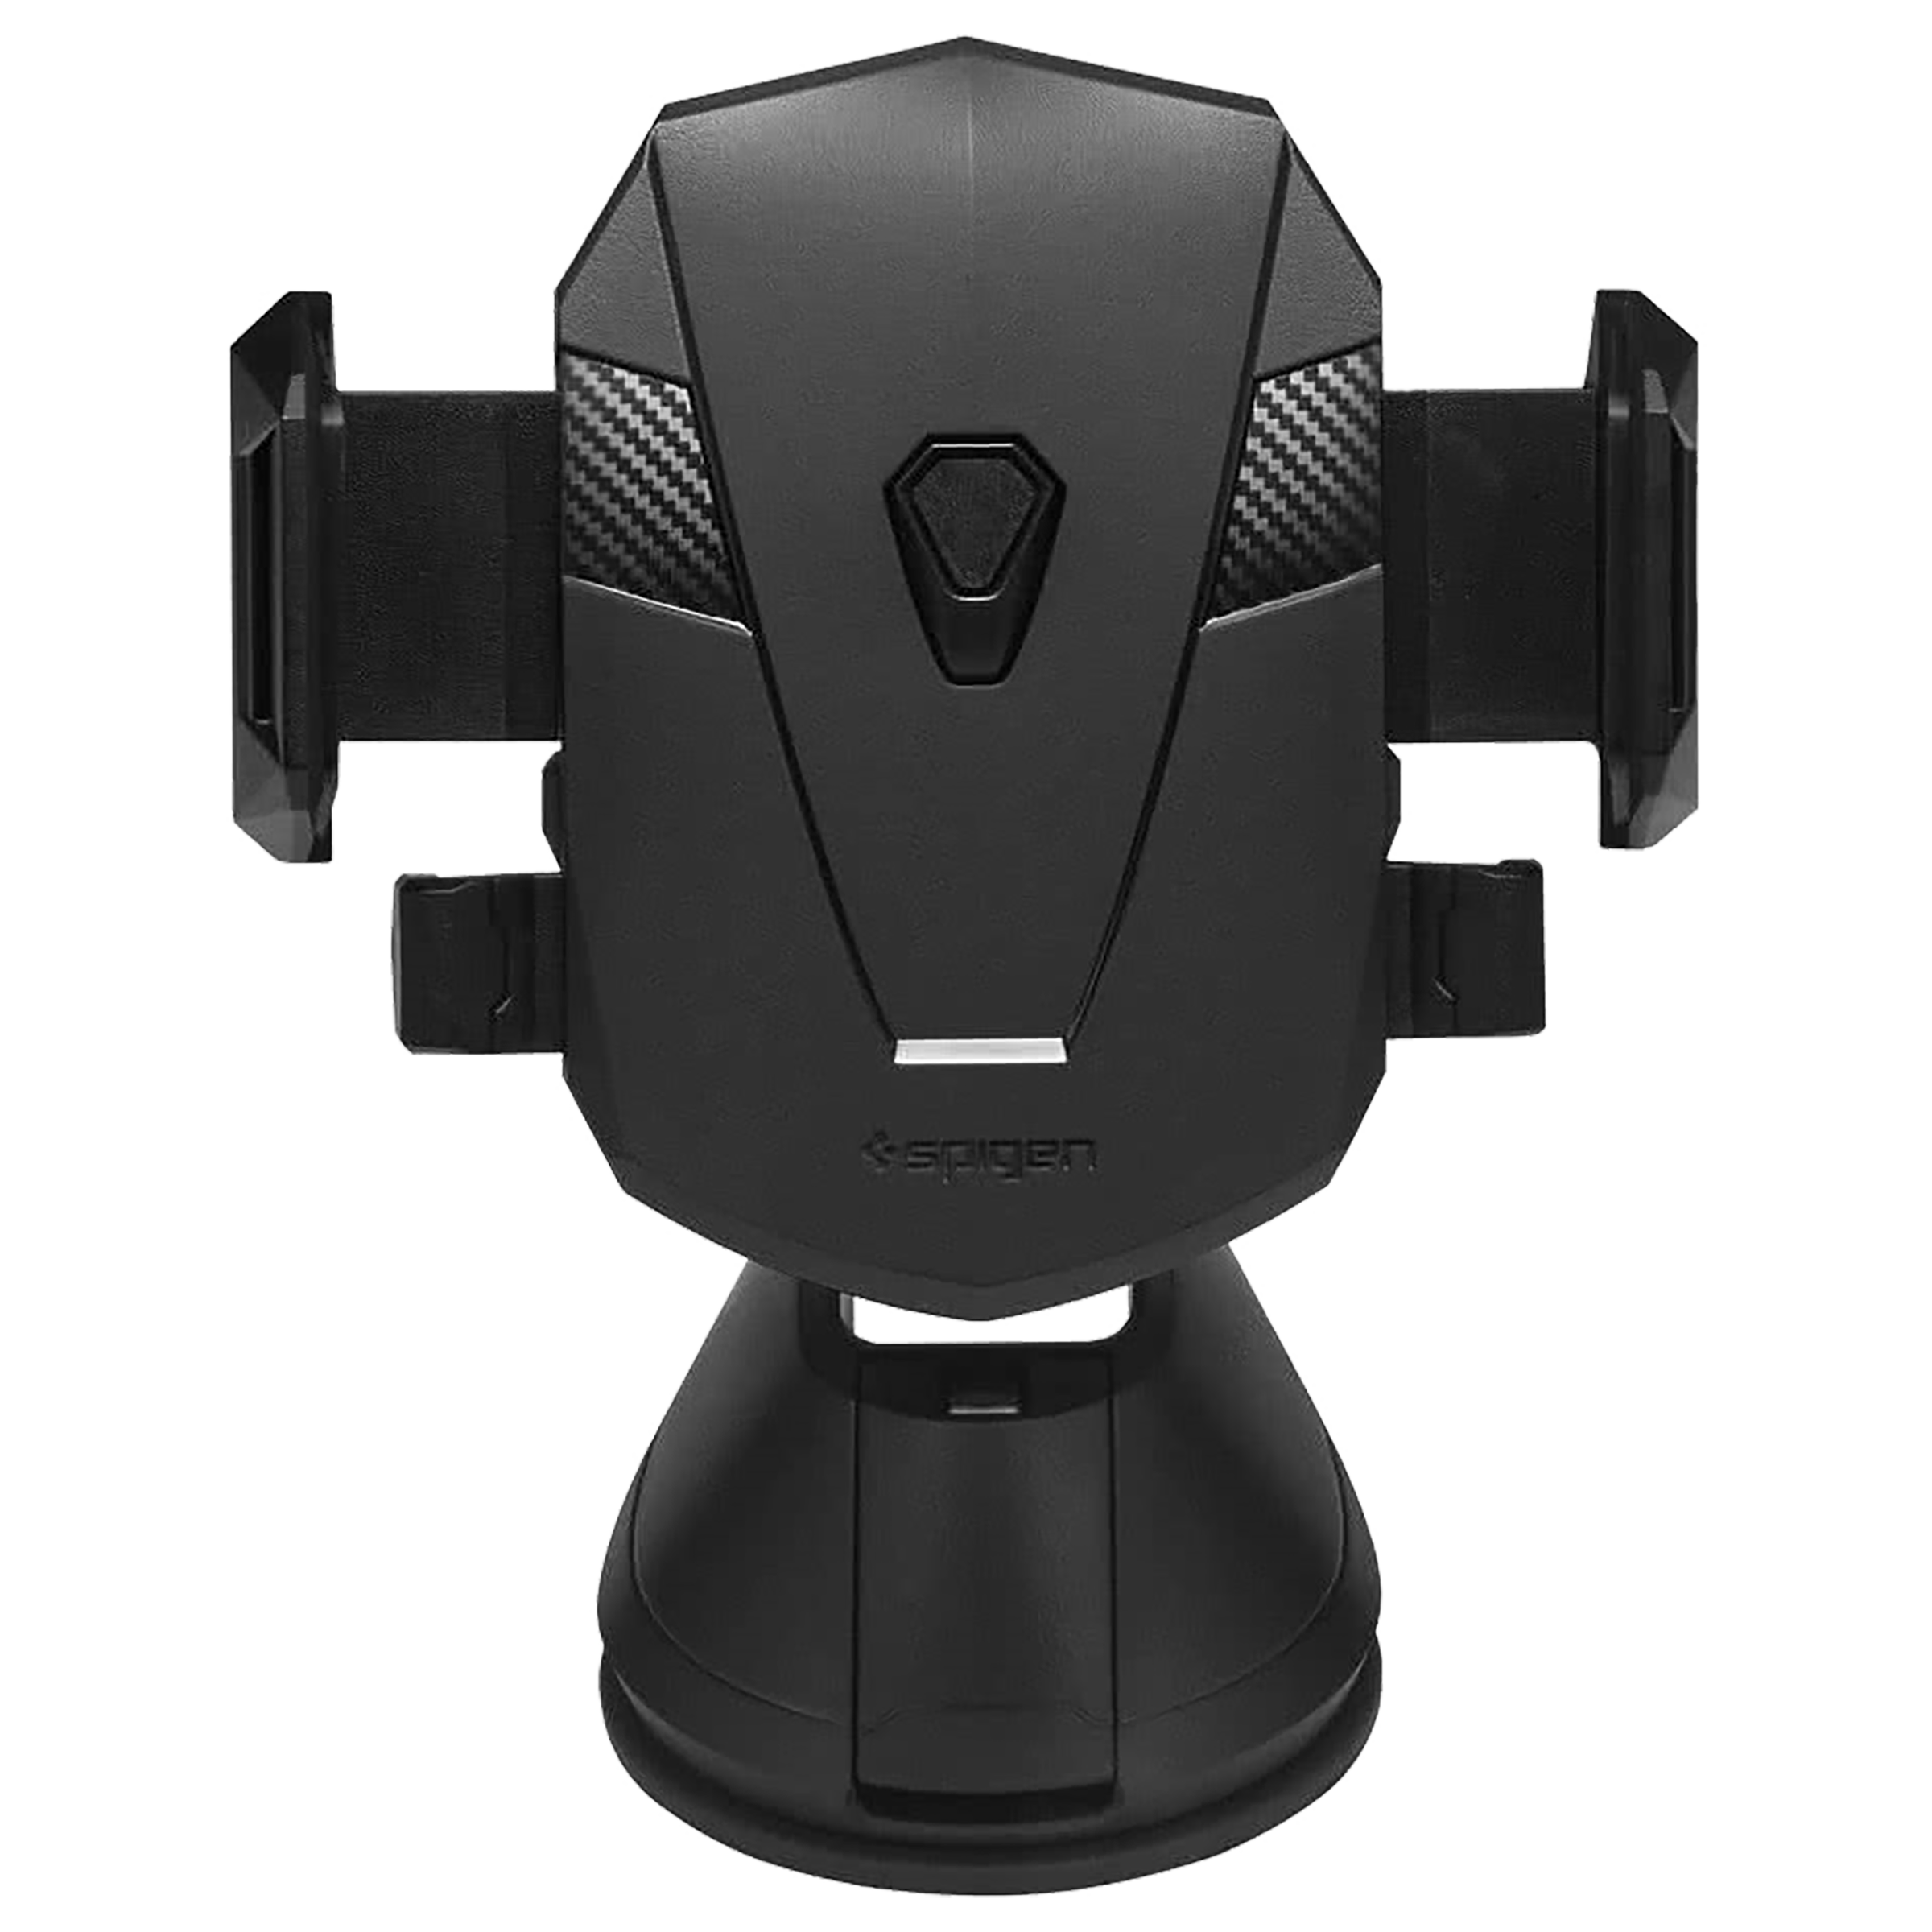 Spigen Windshield   Dashboard Mobile Holder (Optimum Viewing, 000CG21159, Black)_1